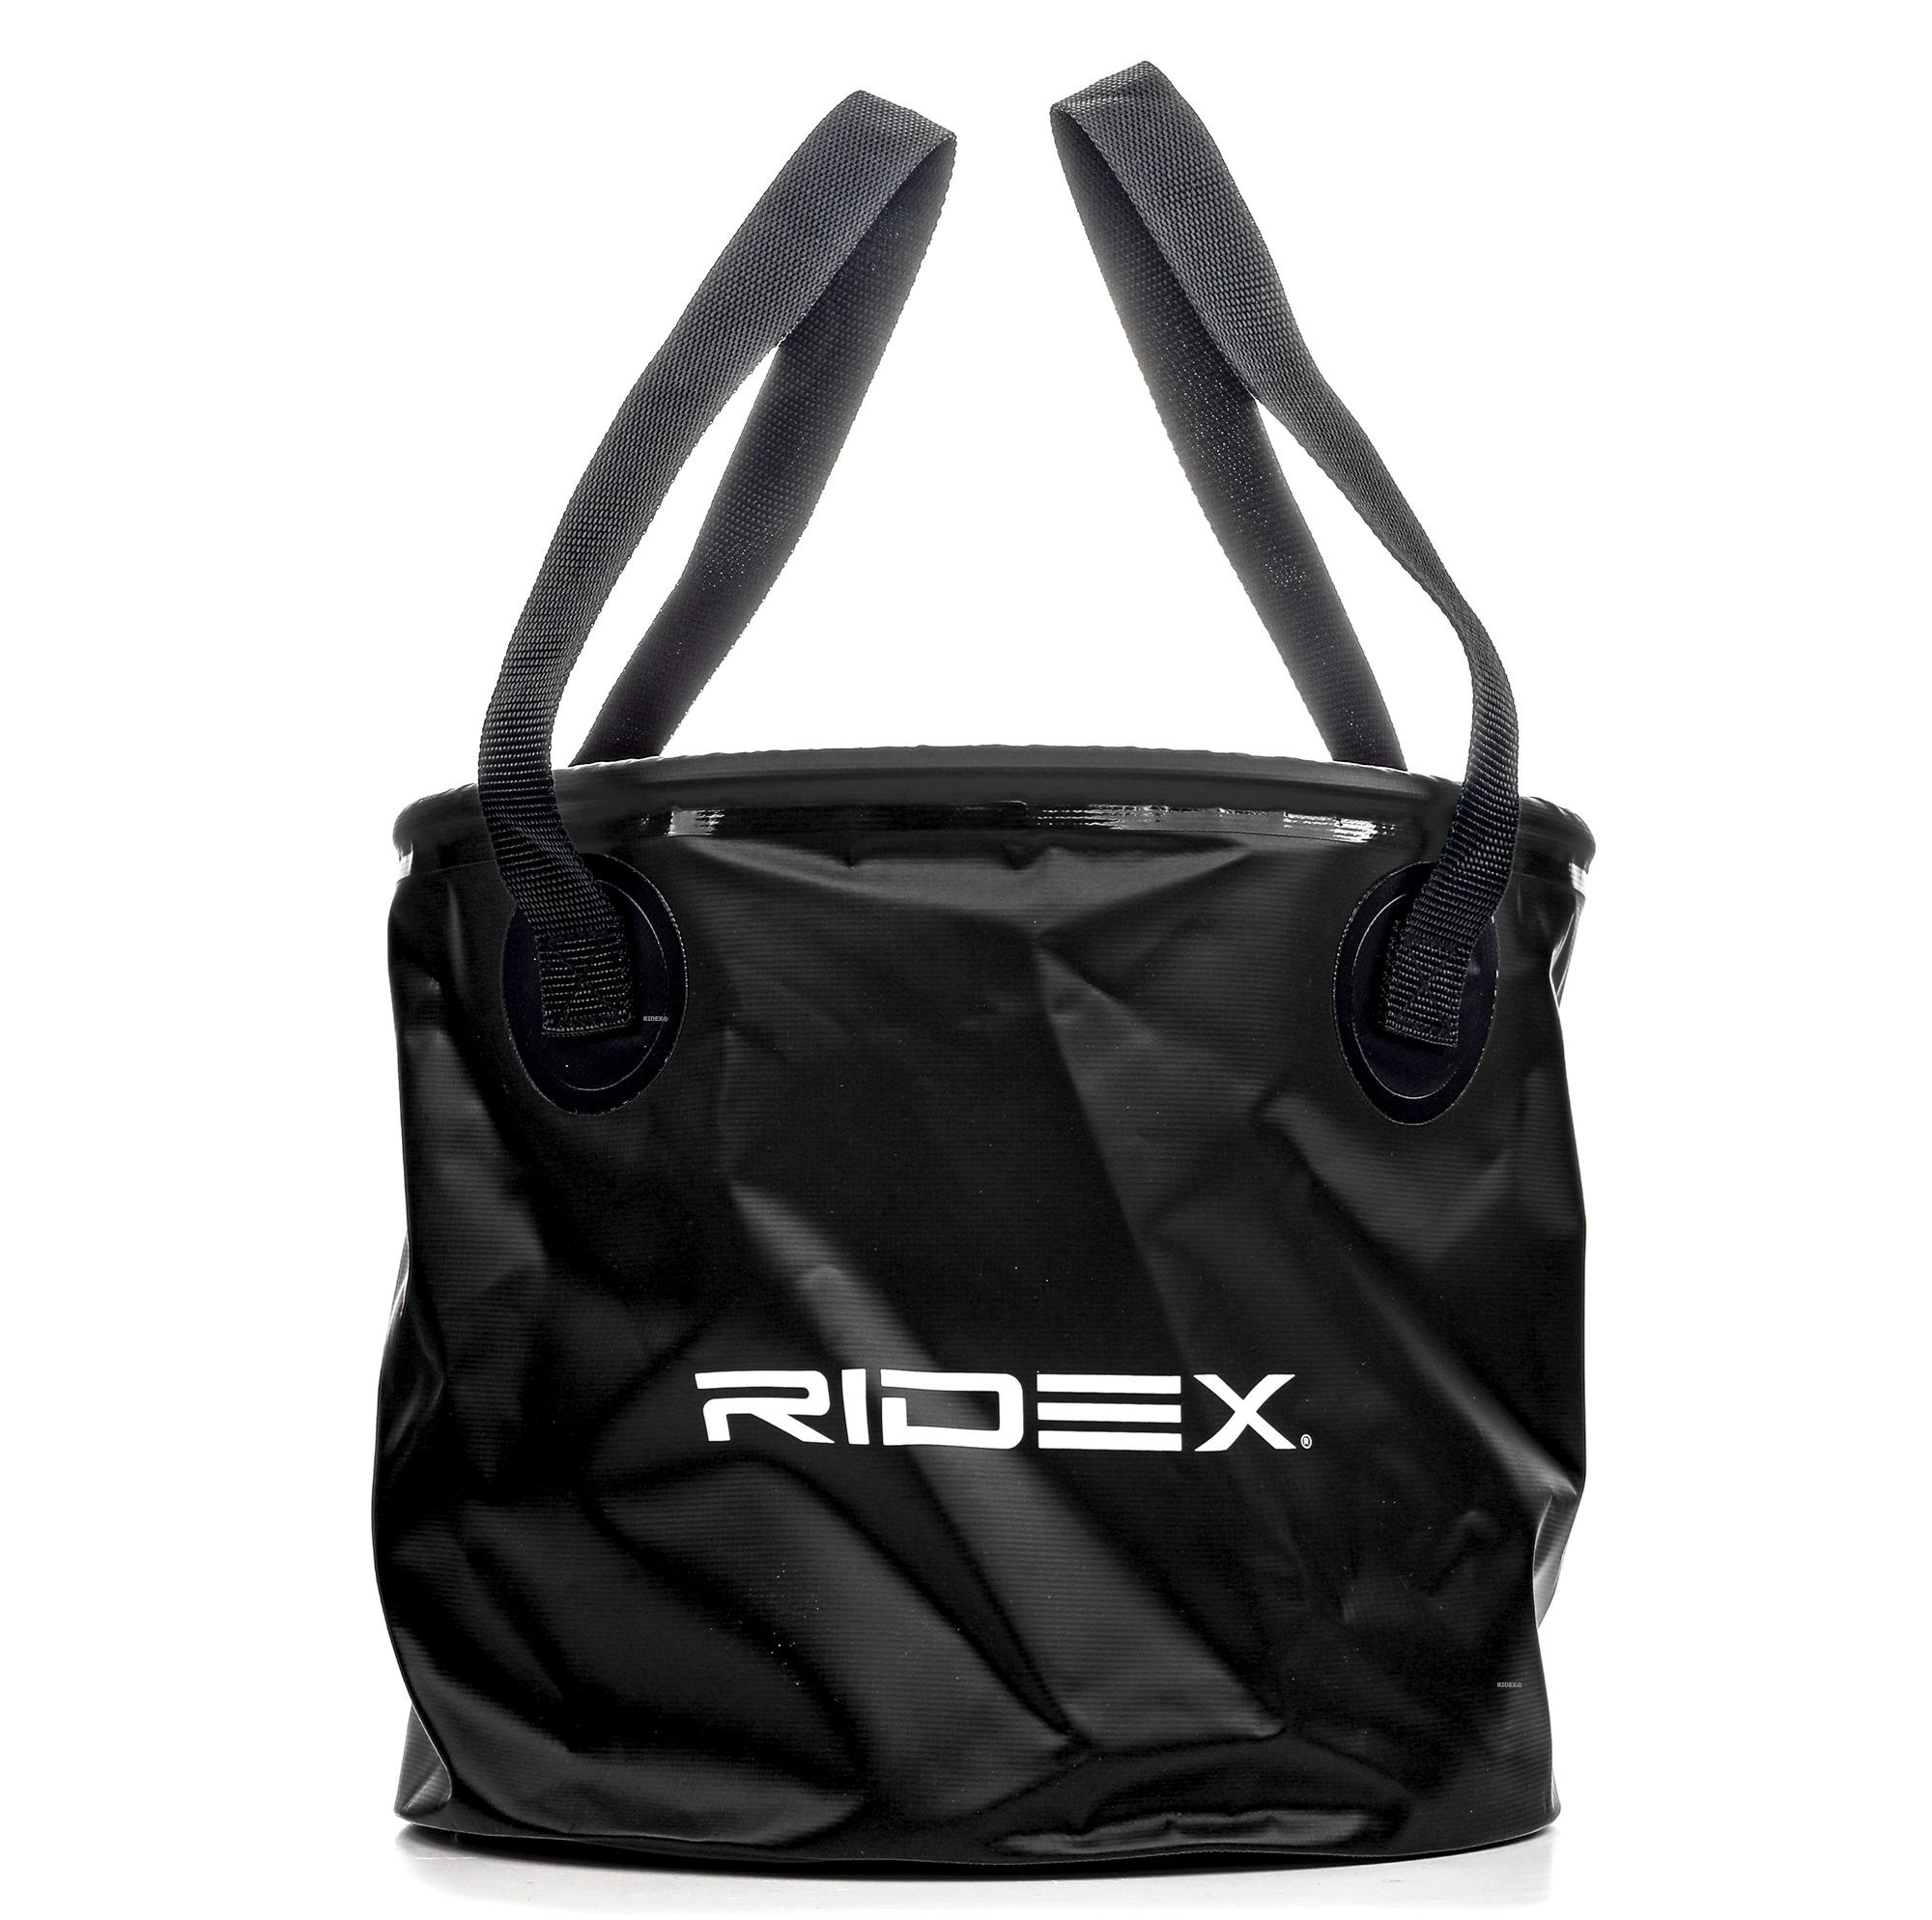 Folding bucket RIDEX 100185A0002 rating